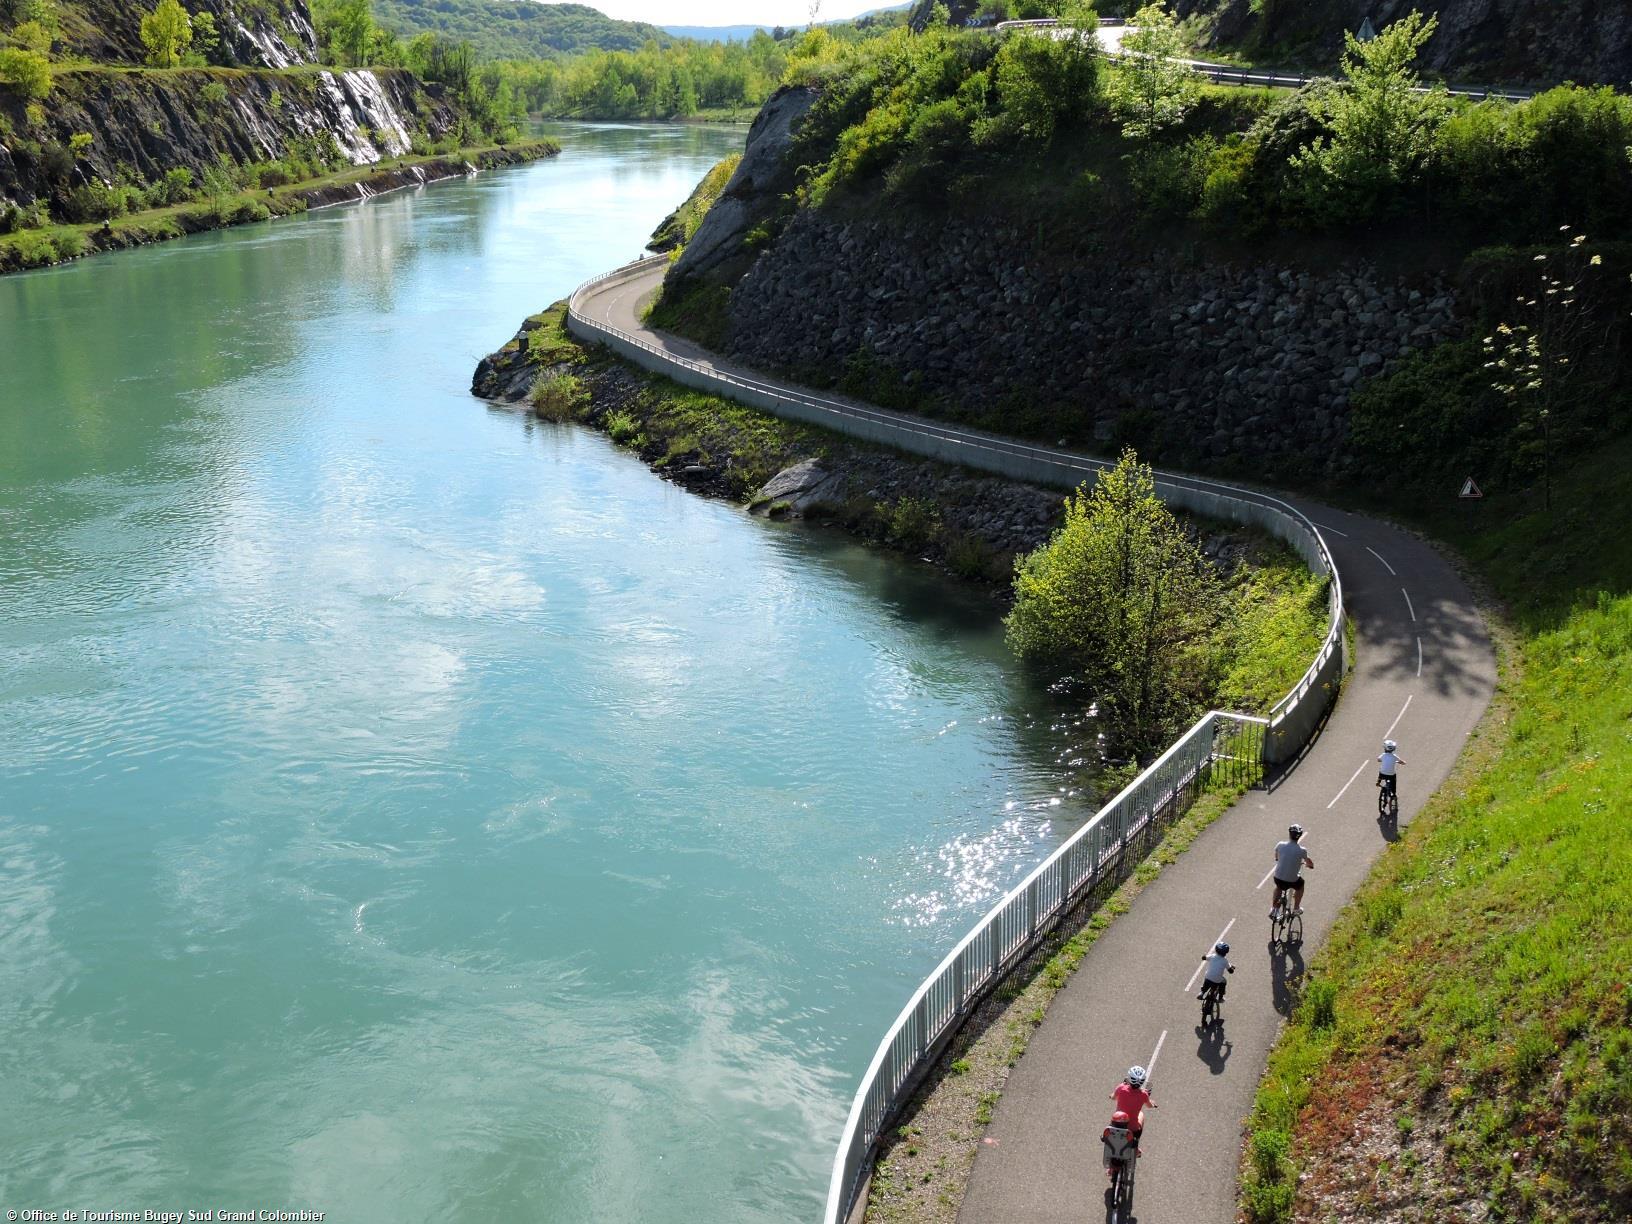 Explorez la ViaRhôna à pied, en vélo, en roller…